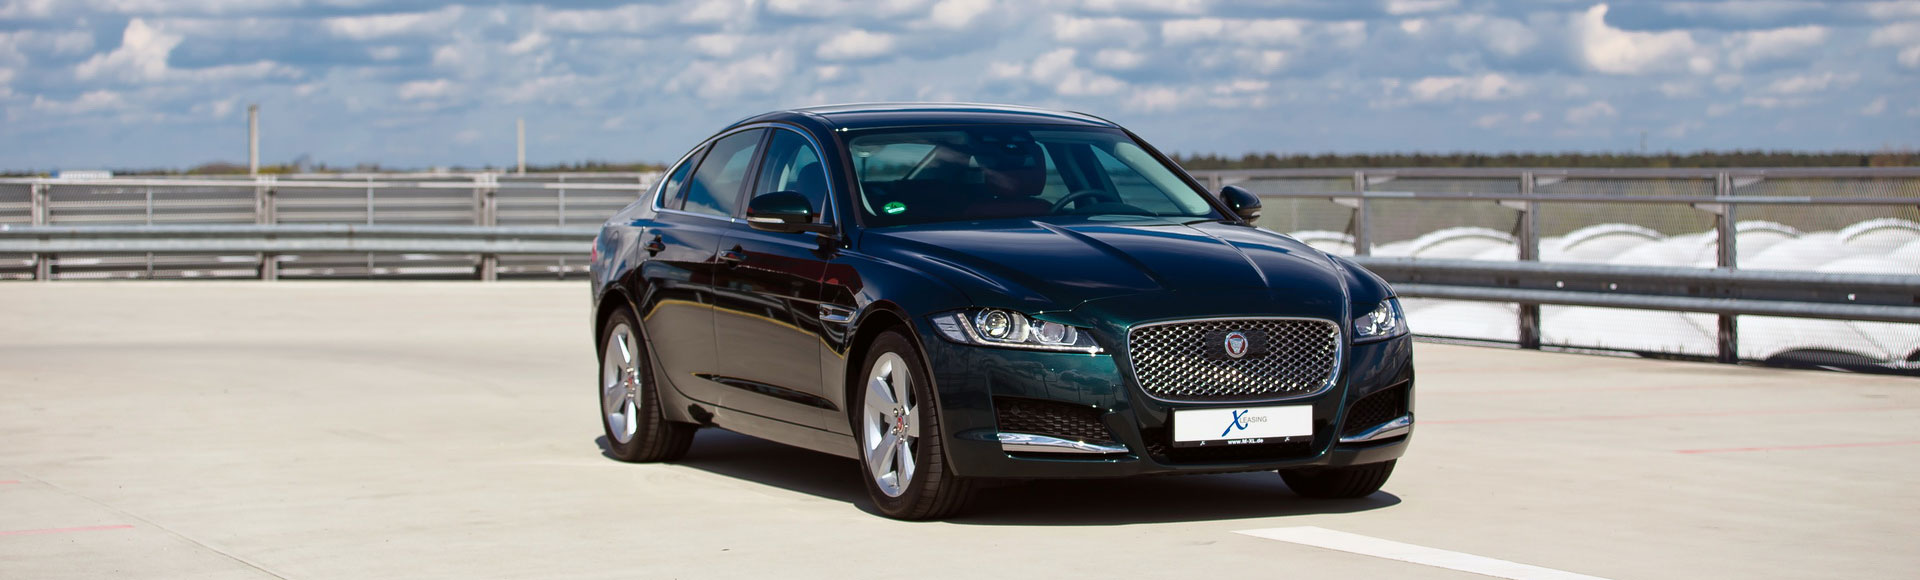 Jaguar XF 2016 170